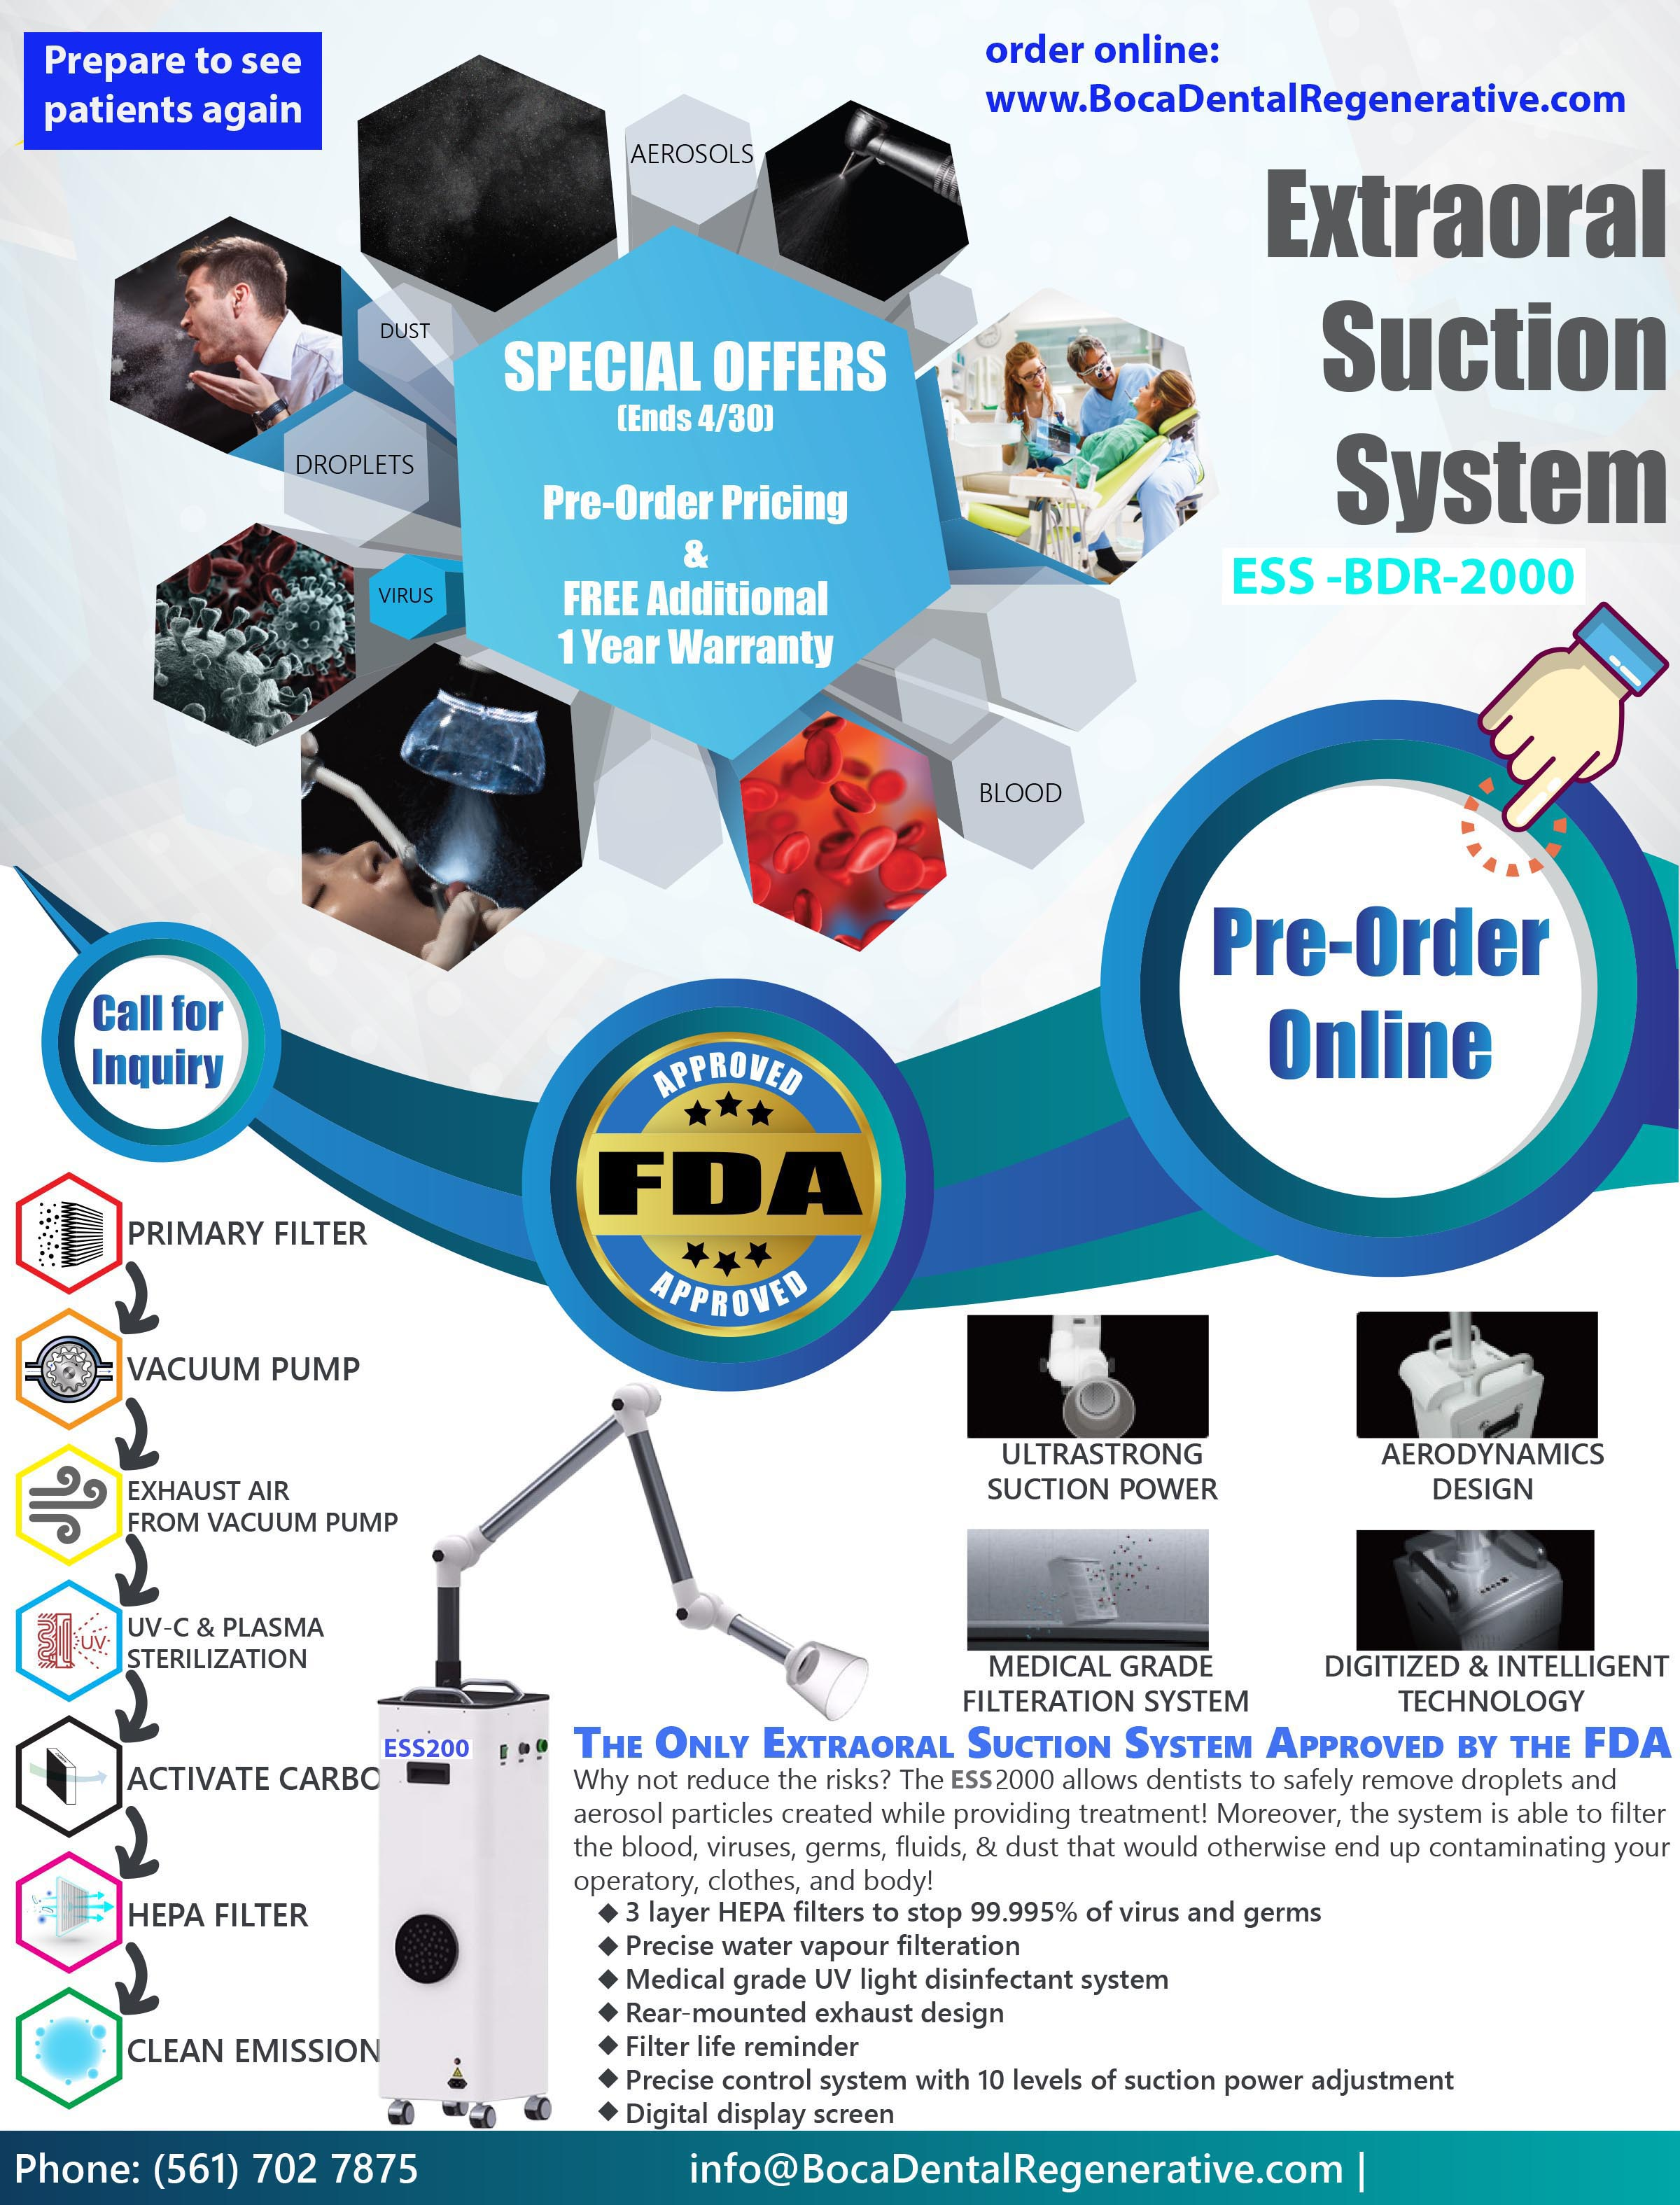 extraoral-suction-system-ess200-bdr.jpg